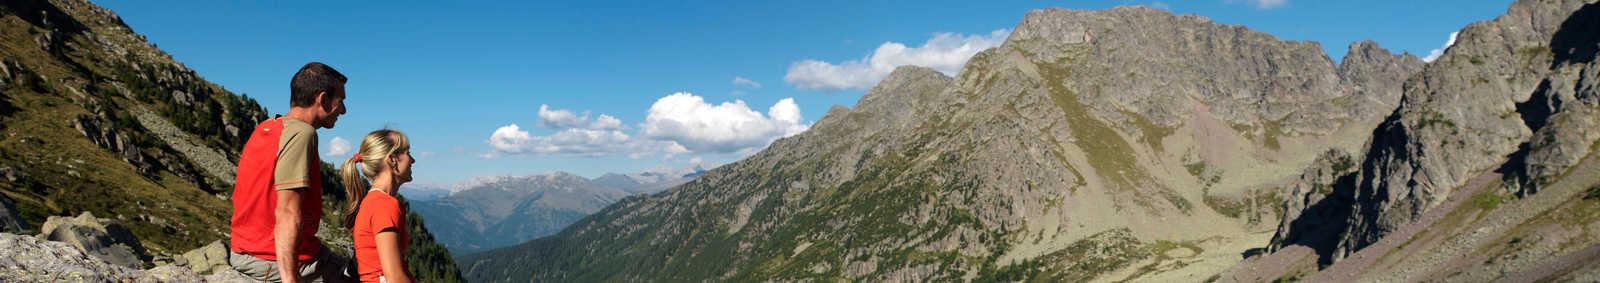 View from Passo Sadole (Alberto Campanile)